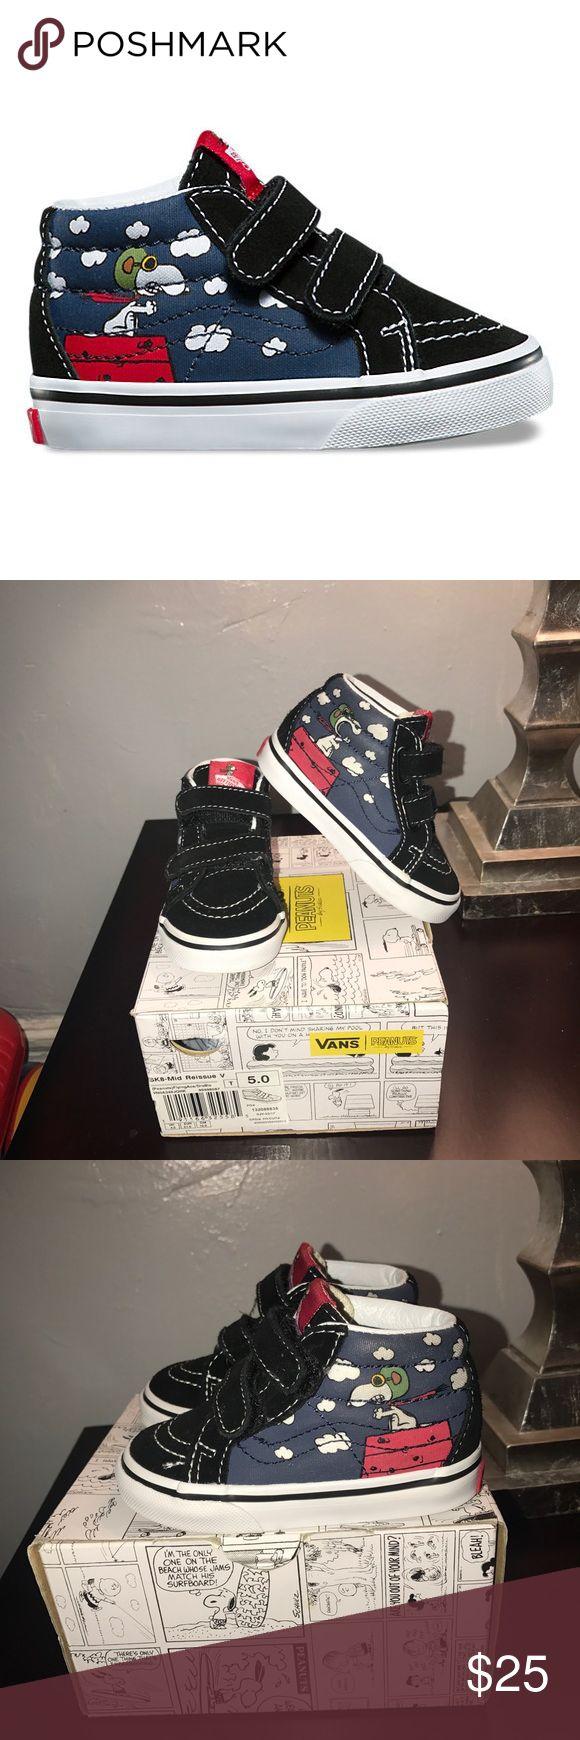 Vans x Peanuts Toddler Sneaker Lightly worn still in good condition minimal signs of wear . Vans Shoes Sneakers